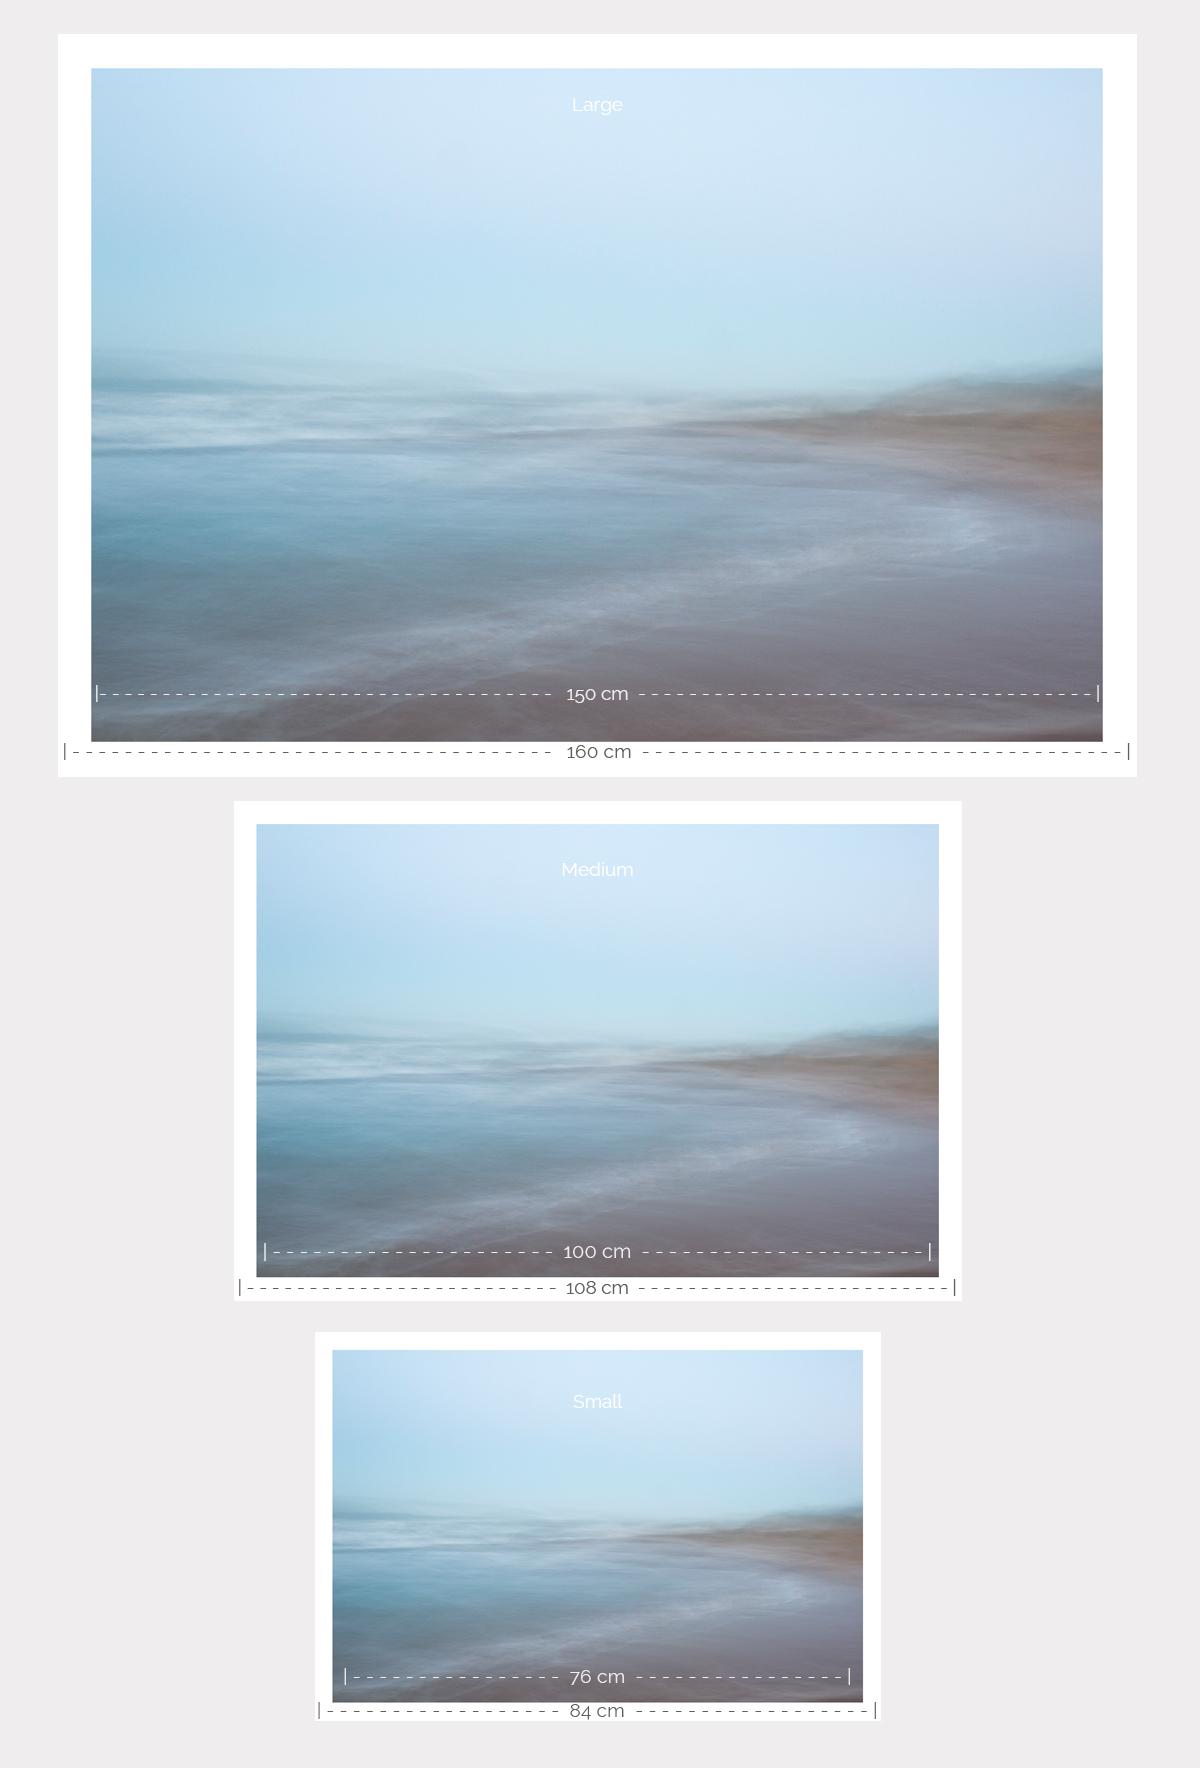 is-joanne-piechota-st-andrews-xi-photographic-art